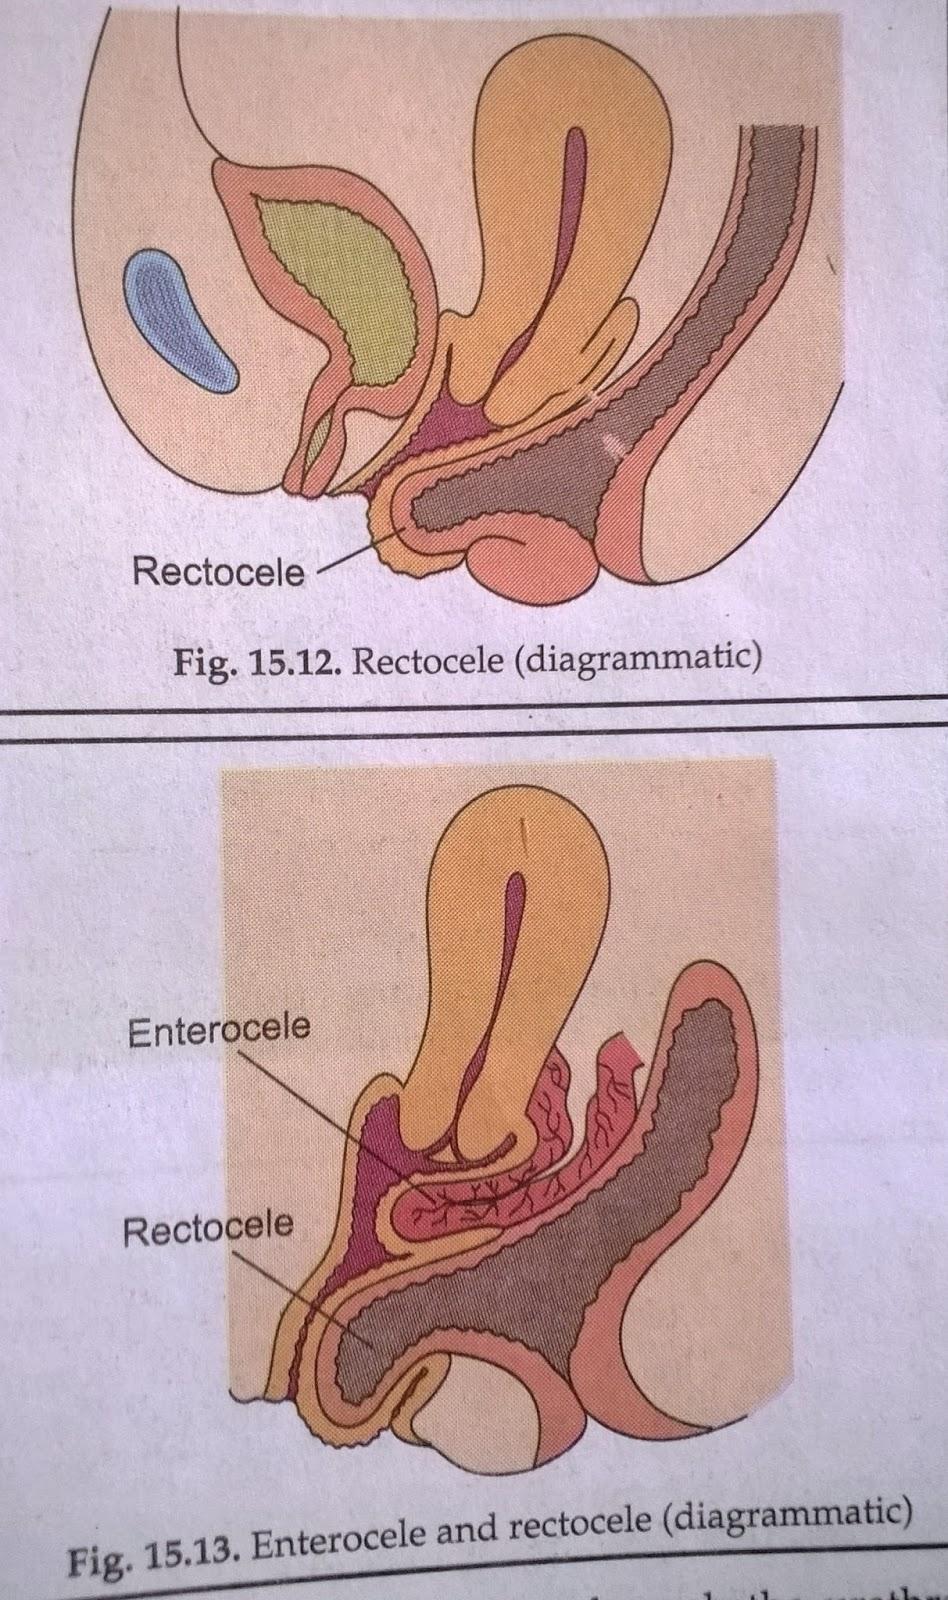 fri fanden uterin prolaps smerter